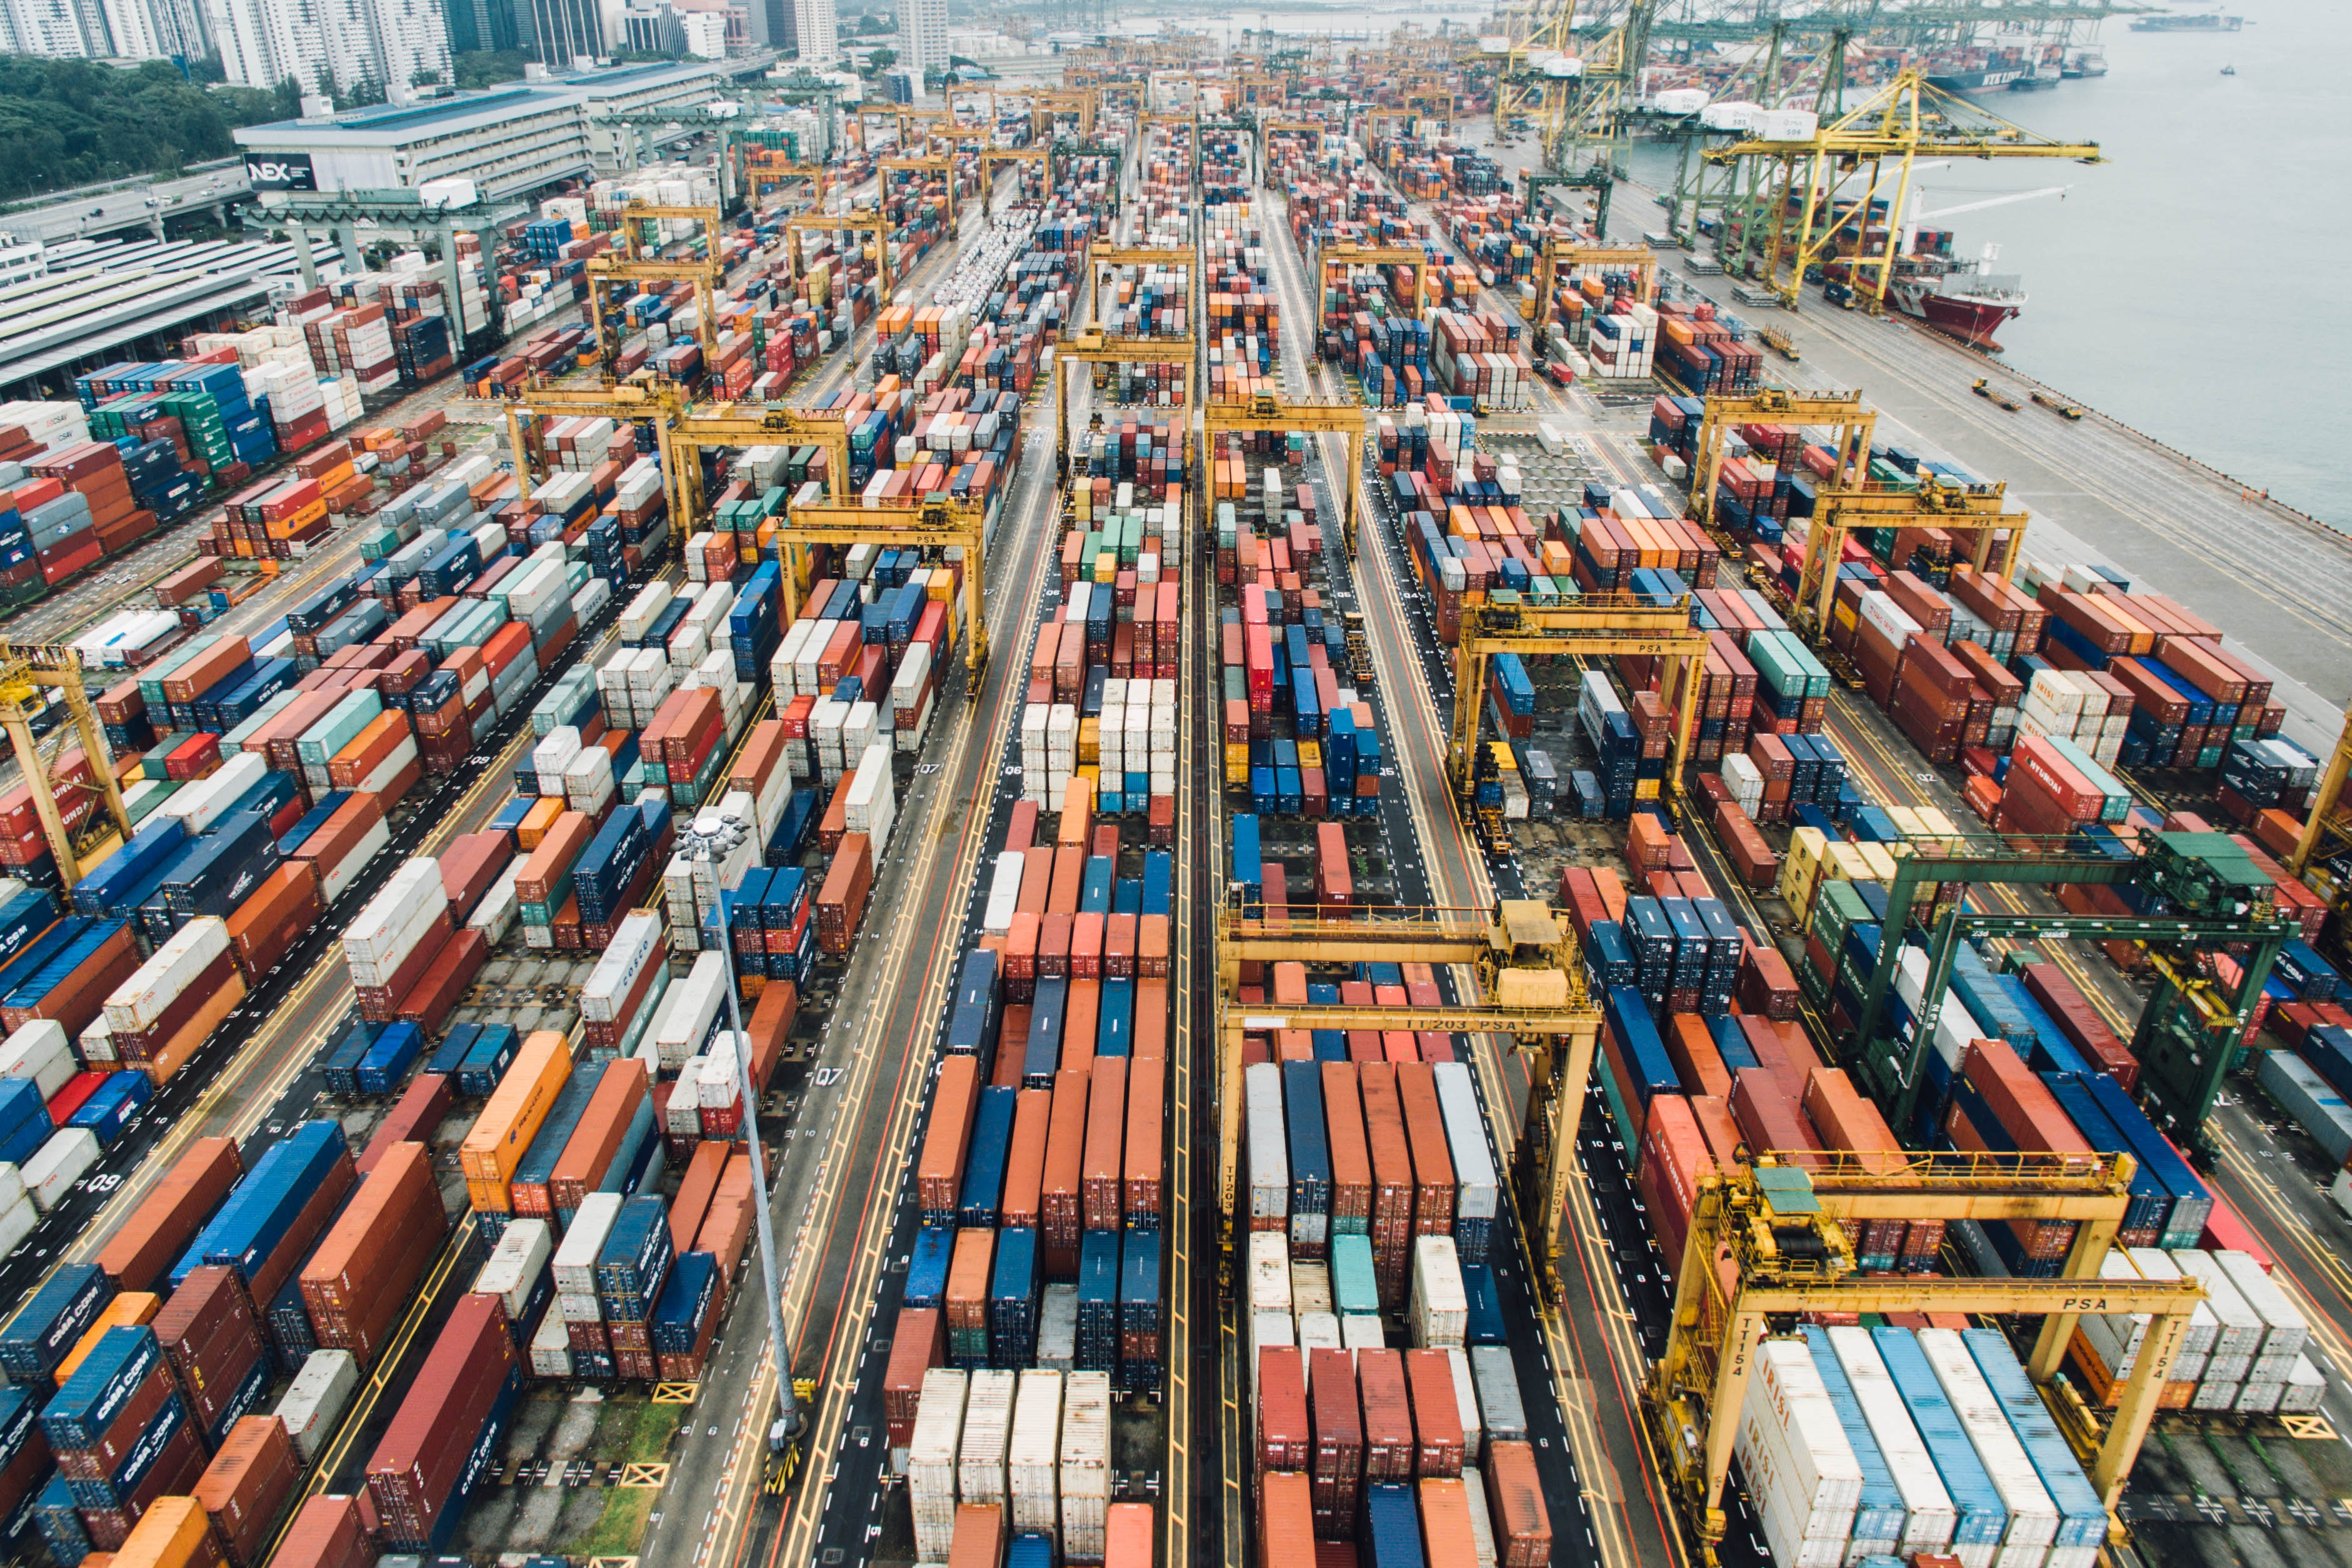 OEA: Operador Econômico Autorizado